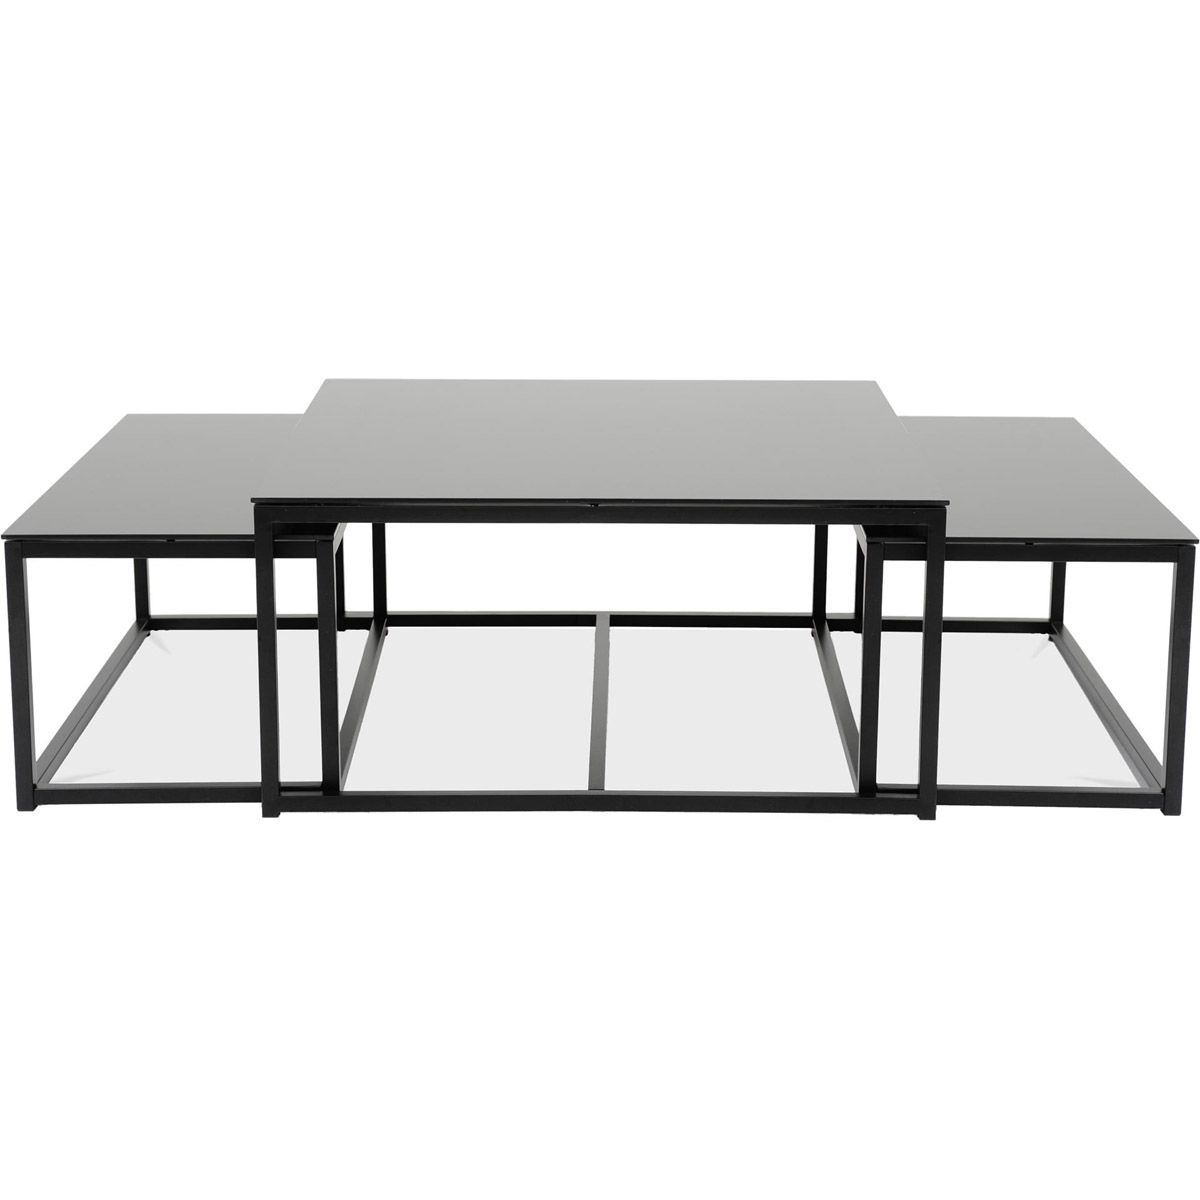 Elton-soffbord-färgat-glas-set